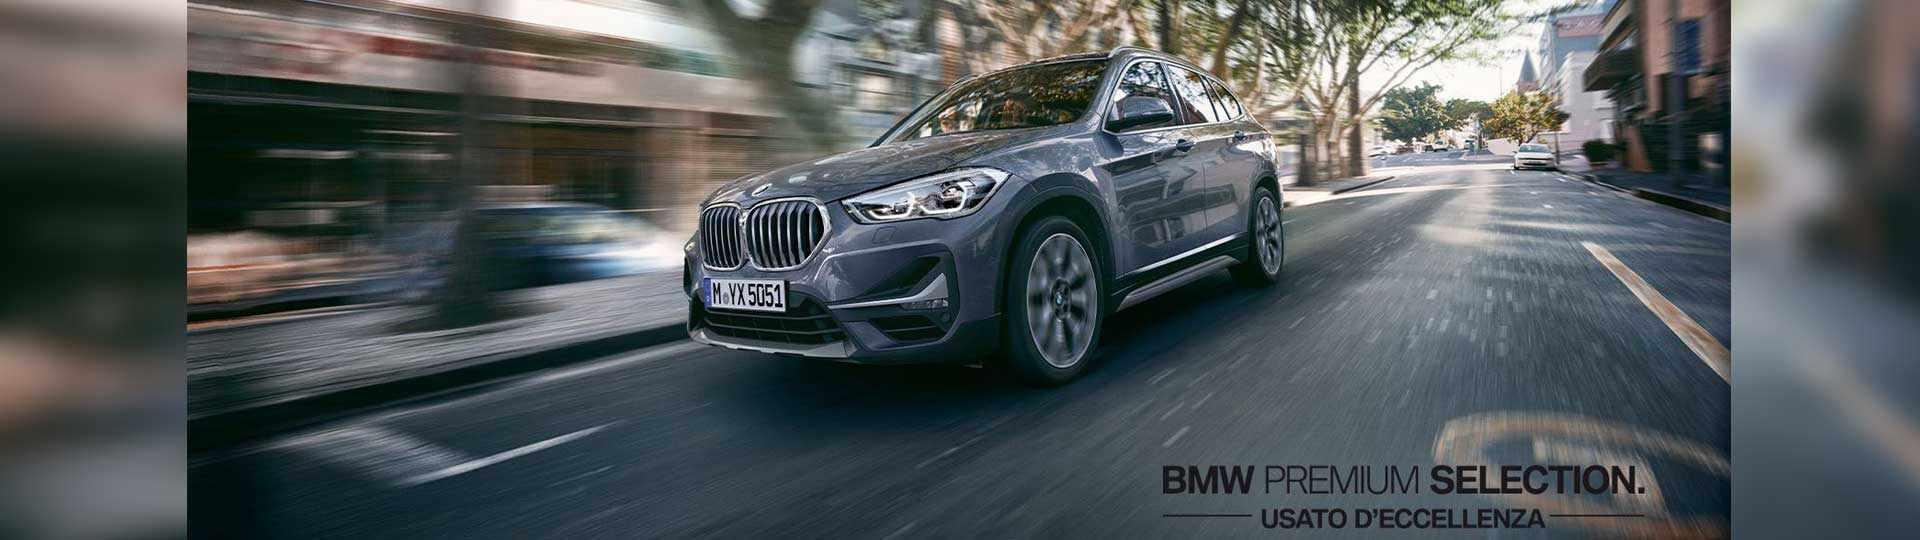 BMW-Premium-Selection_48mesi_novembre-2020-min.jpg